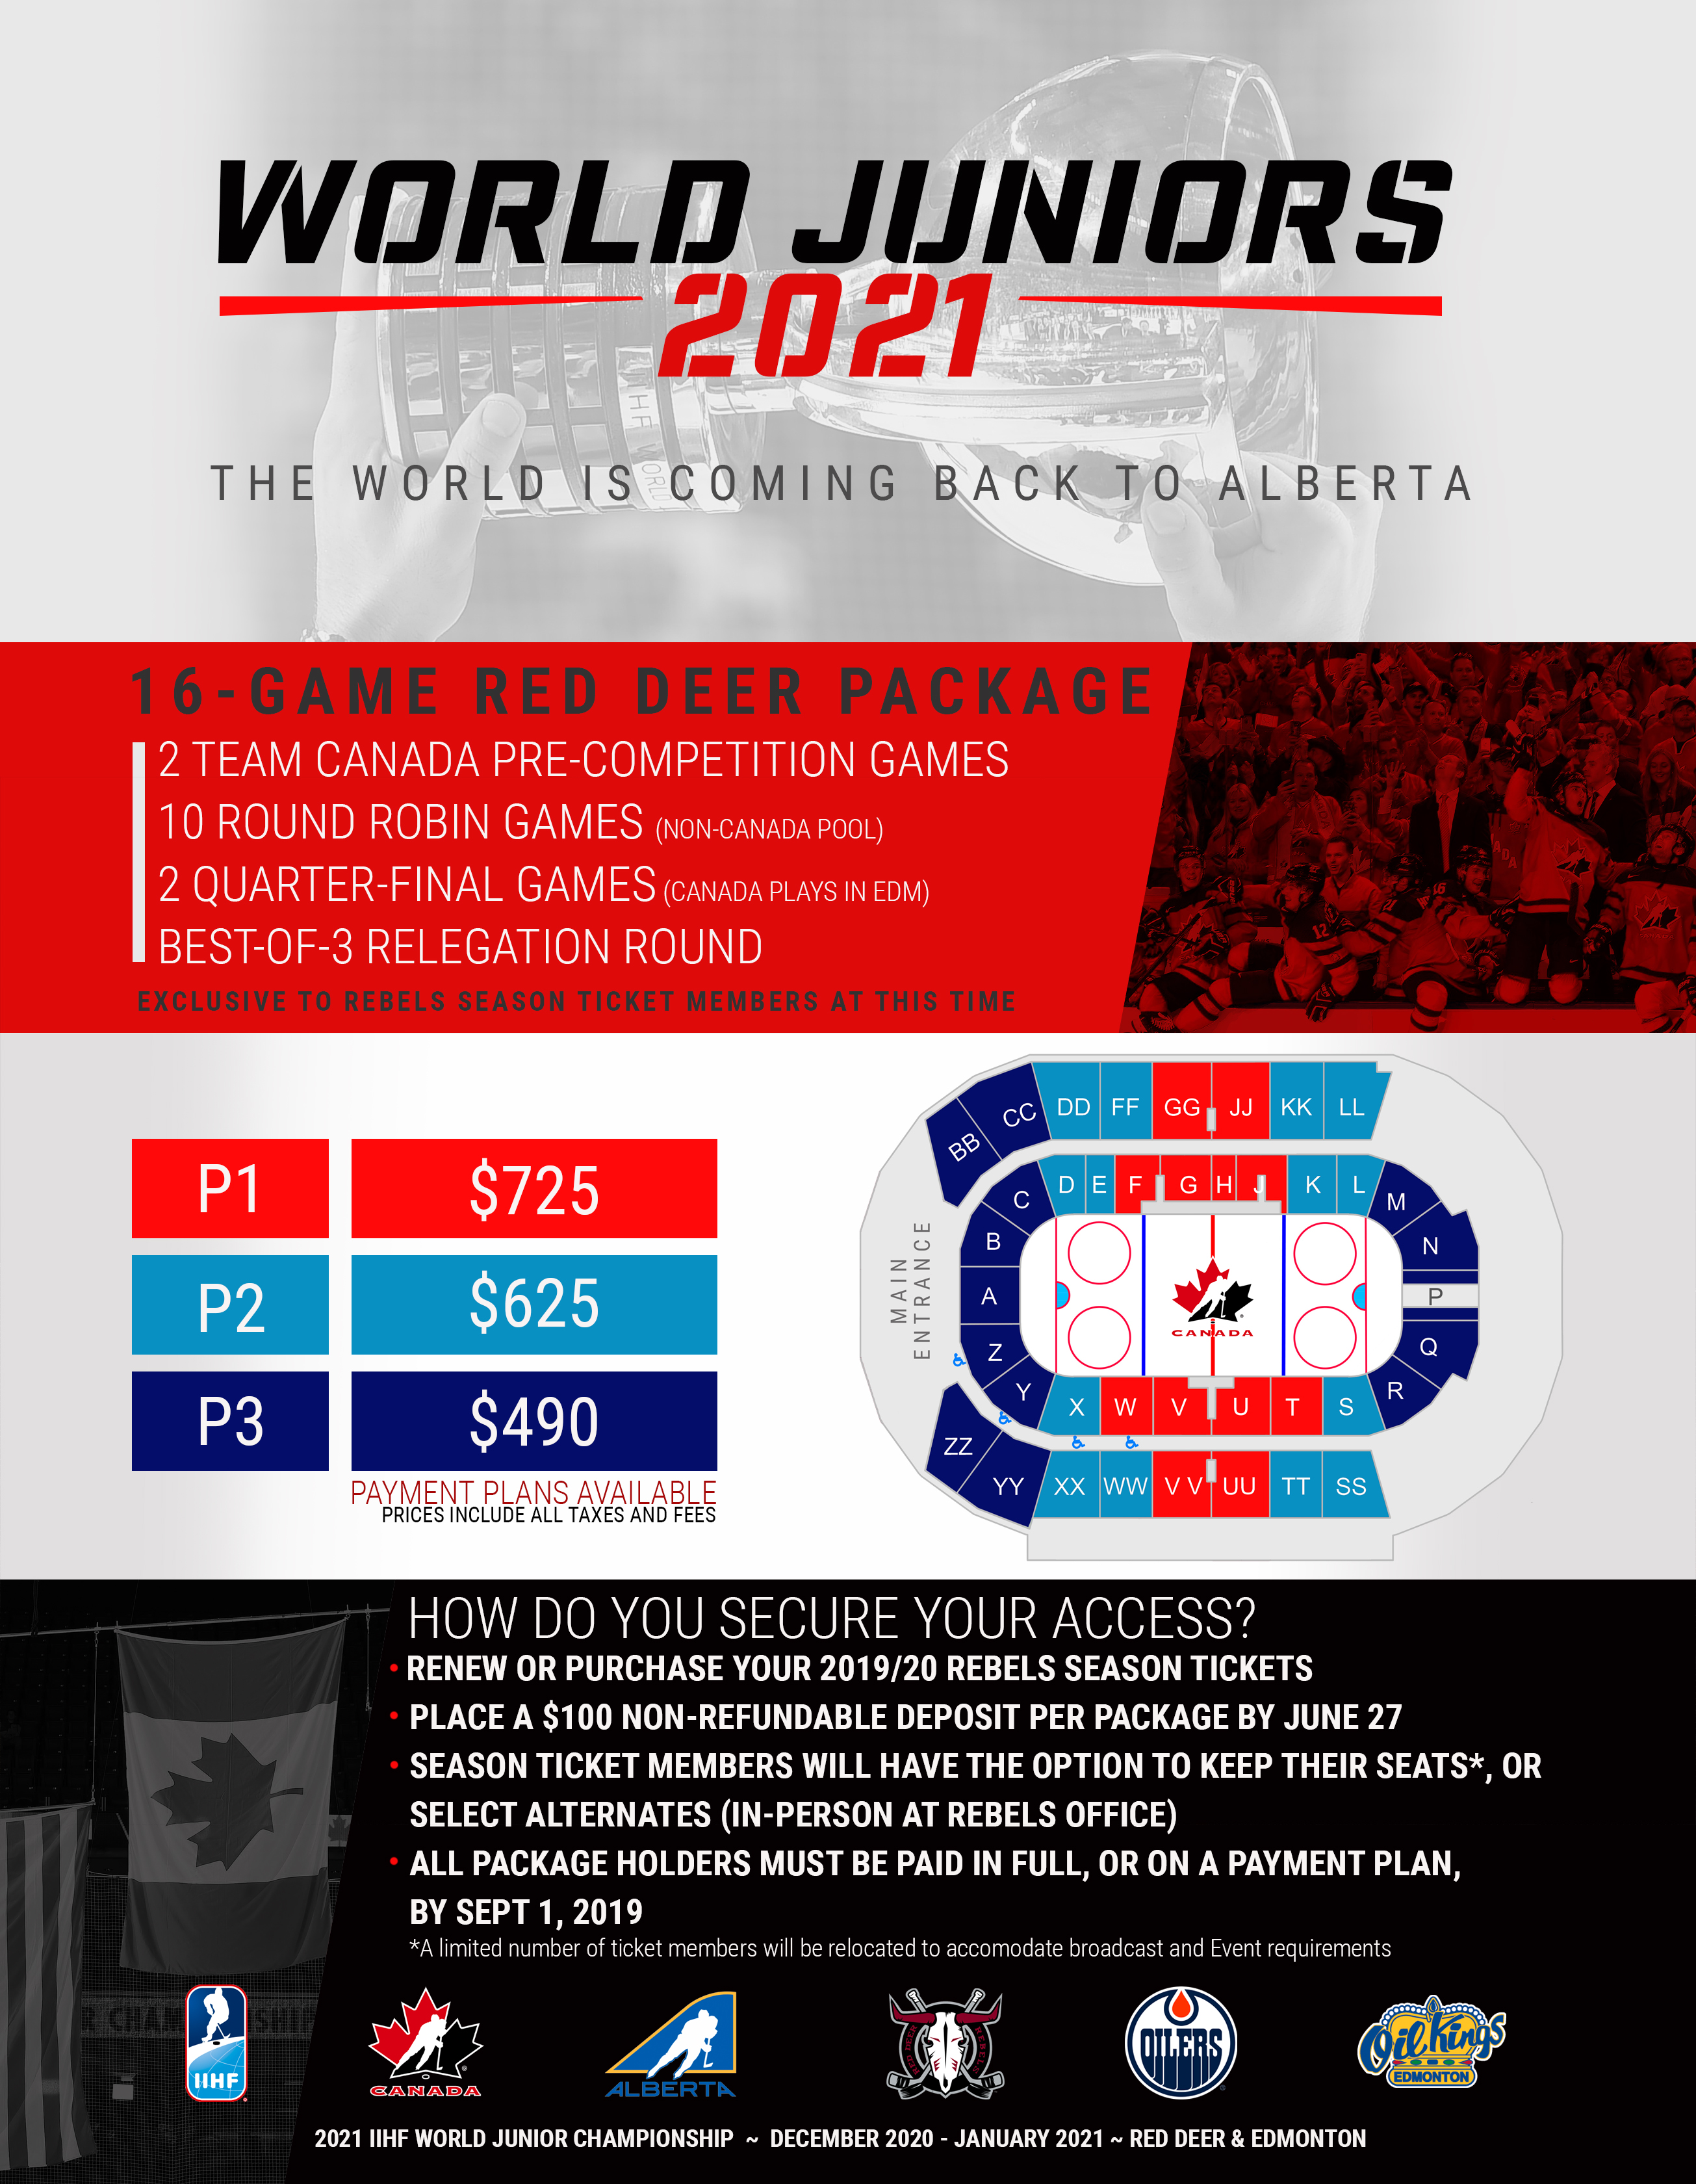 2021 World Juniors Red Deer Rebels